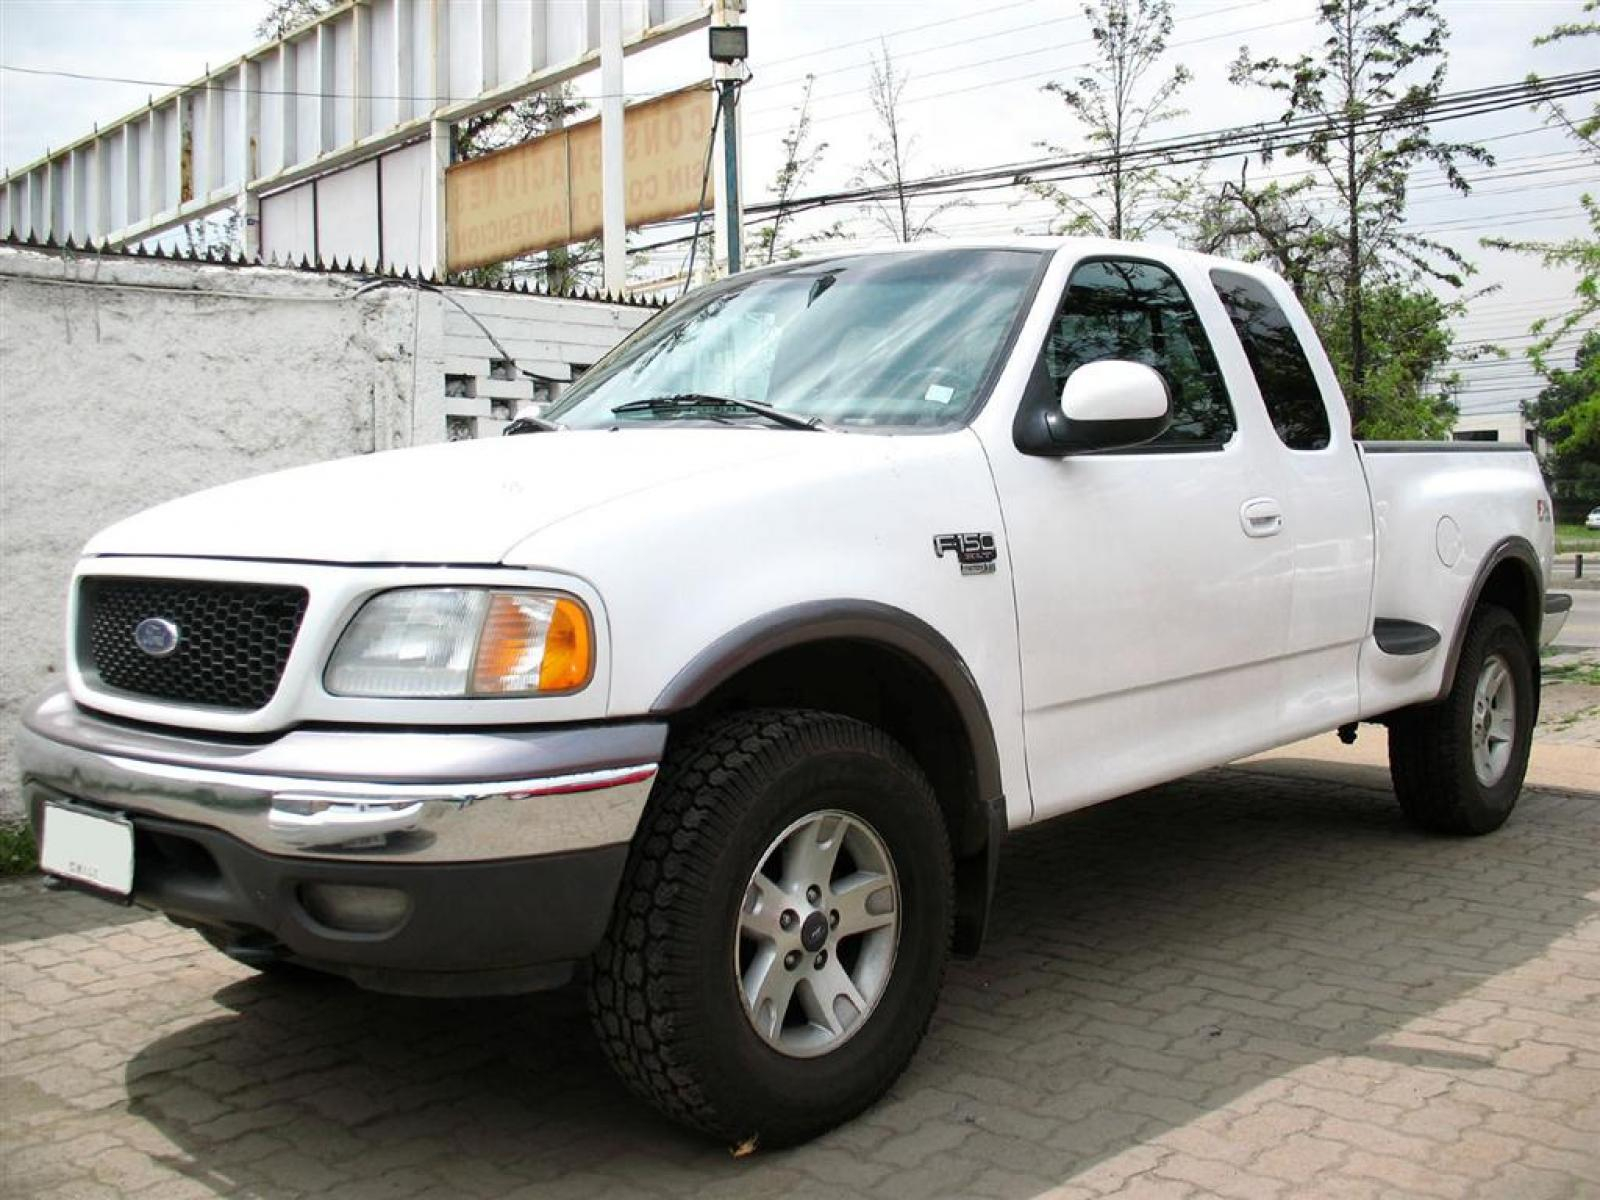 800 1024 1280 1600 origin 2002 ford f 150